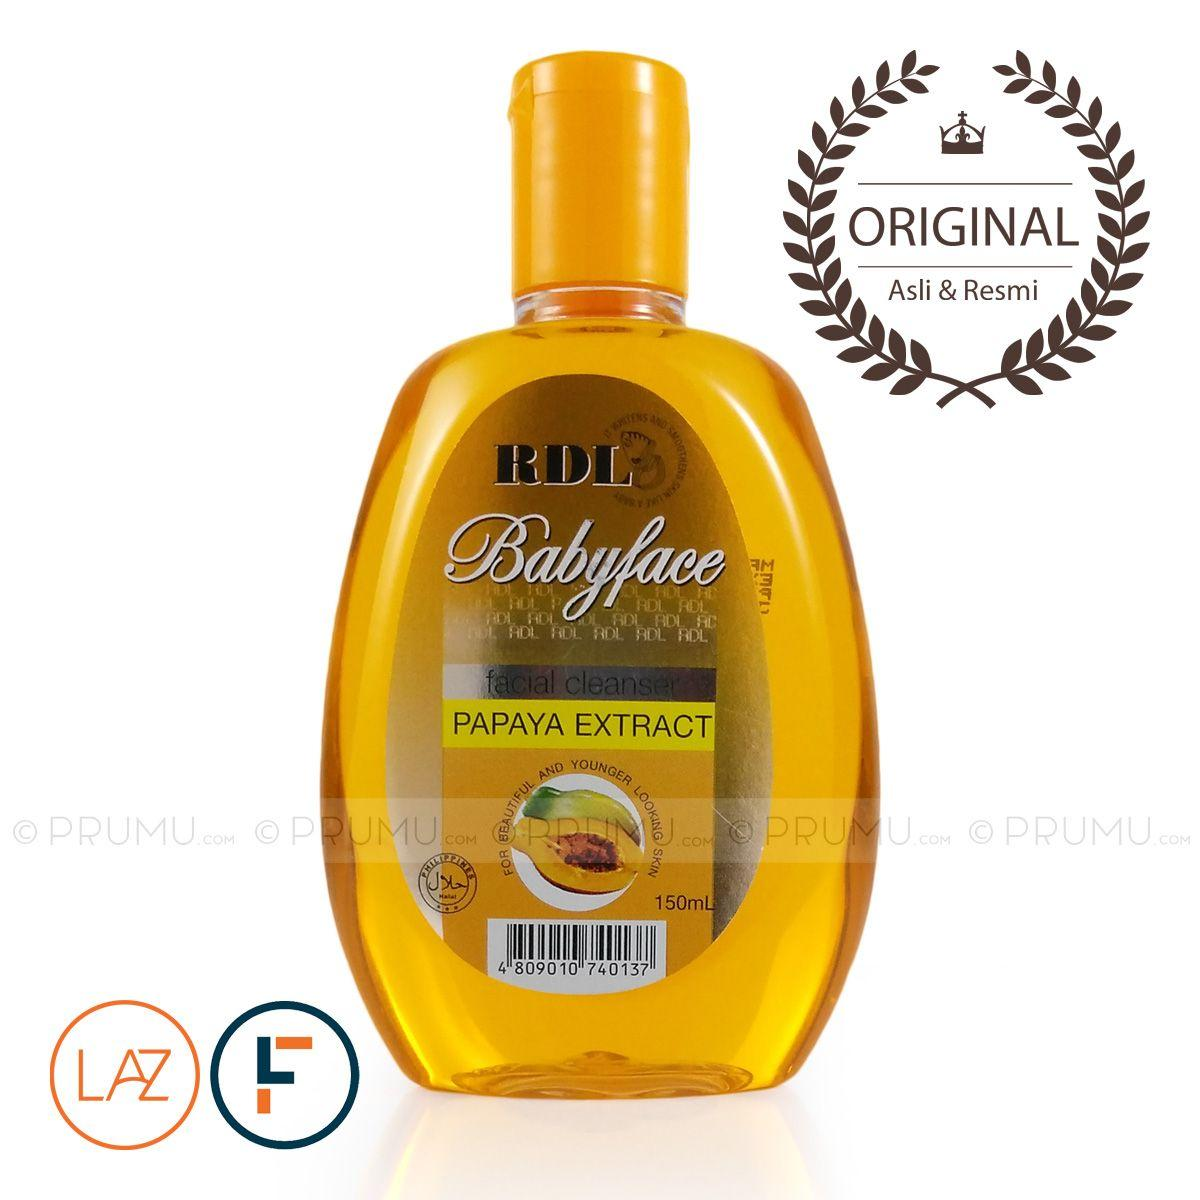 [Original] RDL Babyface Facial Cleanser Papaya Extract 150ml - Pembersih Wajah Ekstrak Pepaya by LAZADA